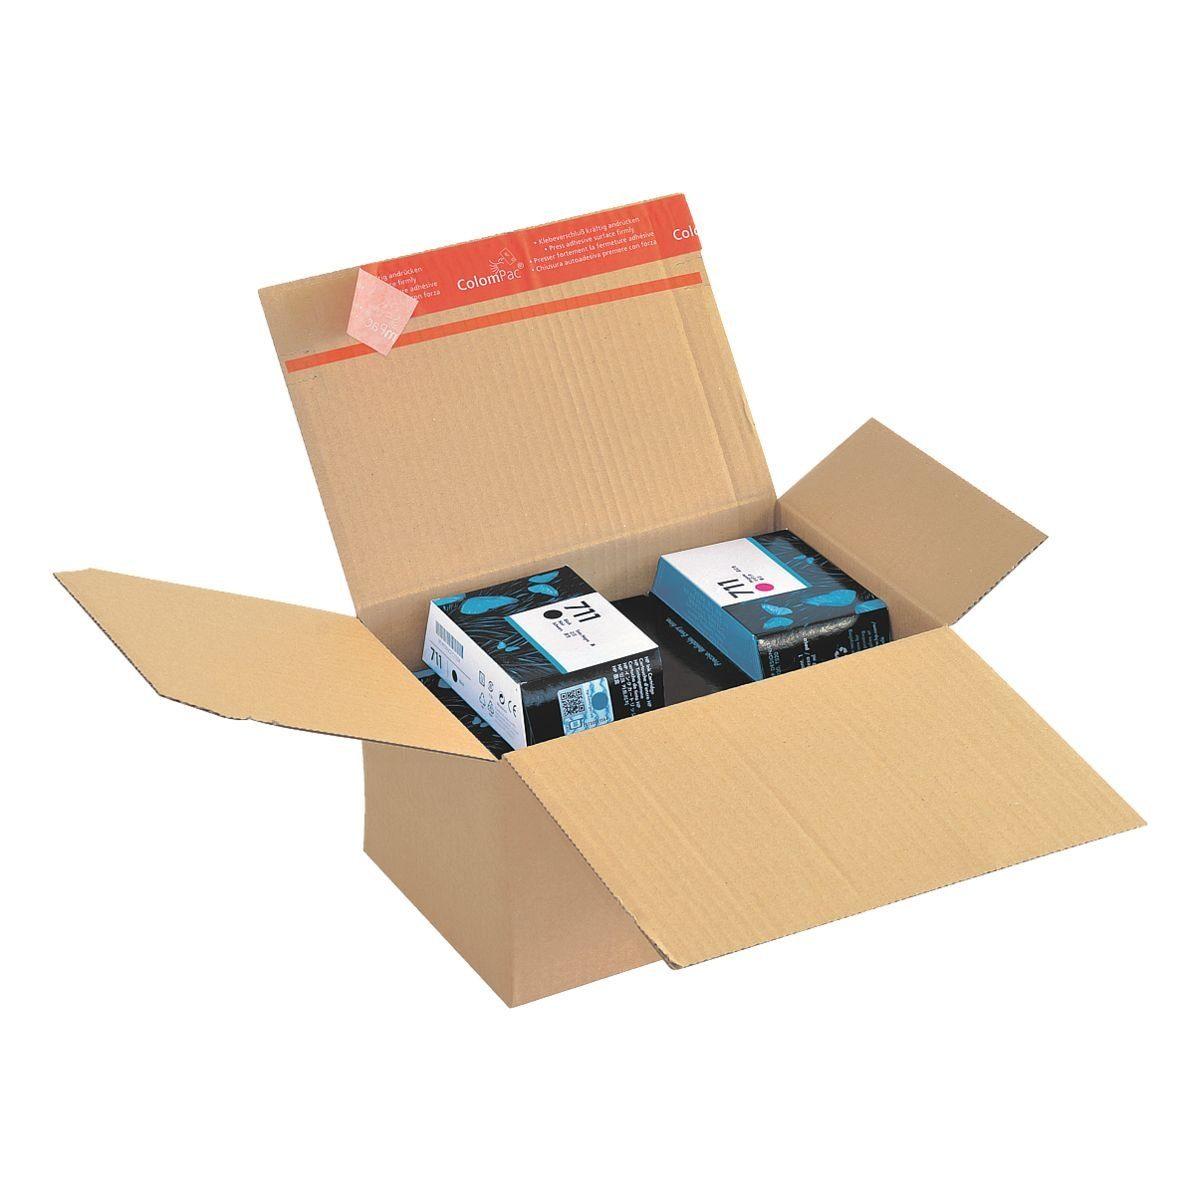 COLOMPAC Blitzbodenkartons 16,0/23,0/12,5 cm